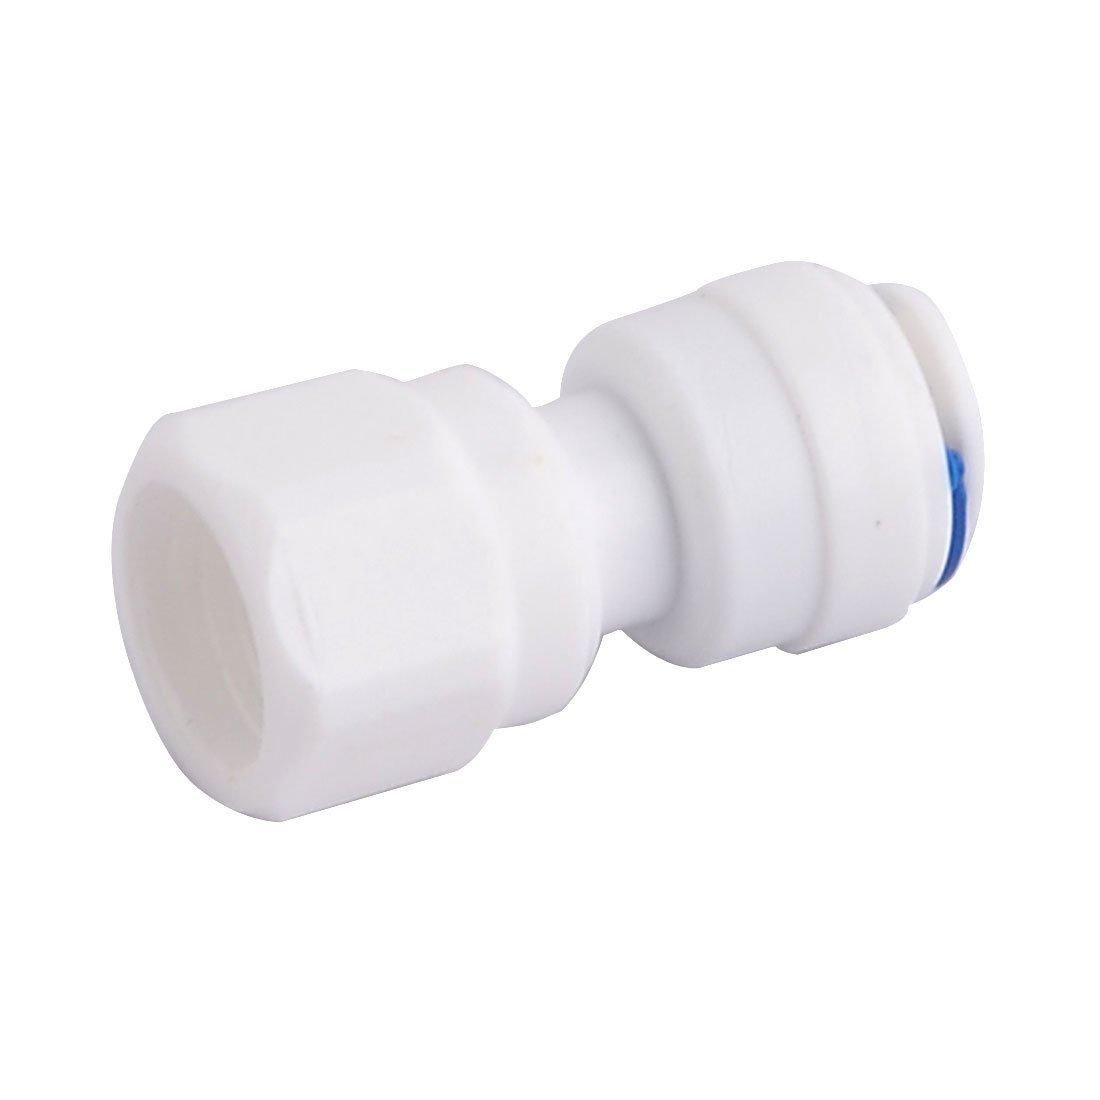 Amazon.com: DealMux Plastic Purificador de Água Adaptador de montagem Conector Branco Azul Tópico Dia 1 / 4BSP: Kitchen & Dining